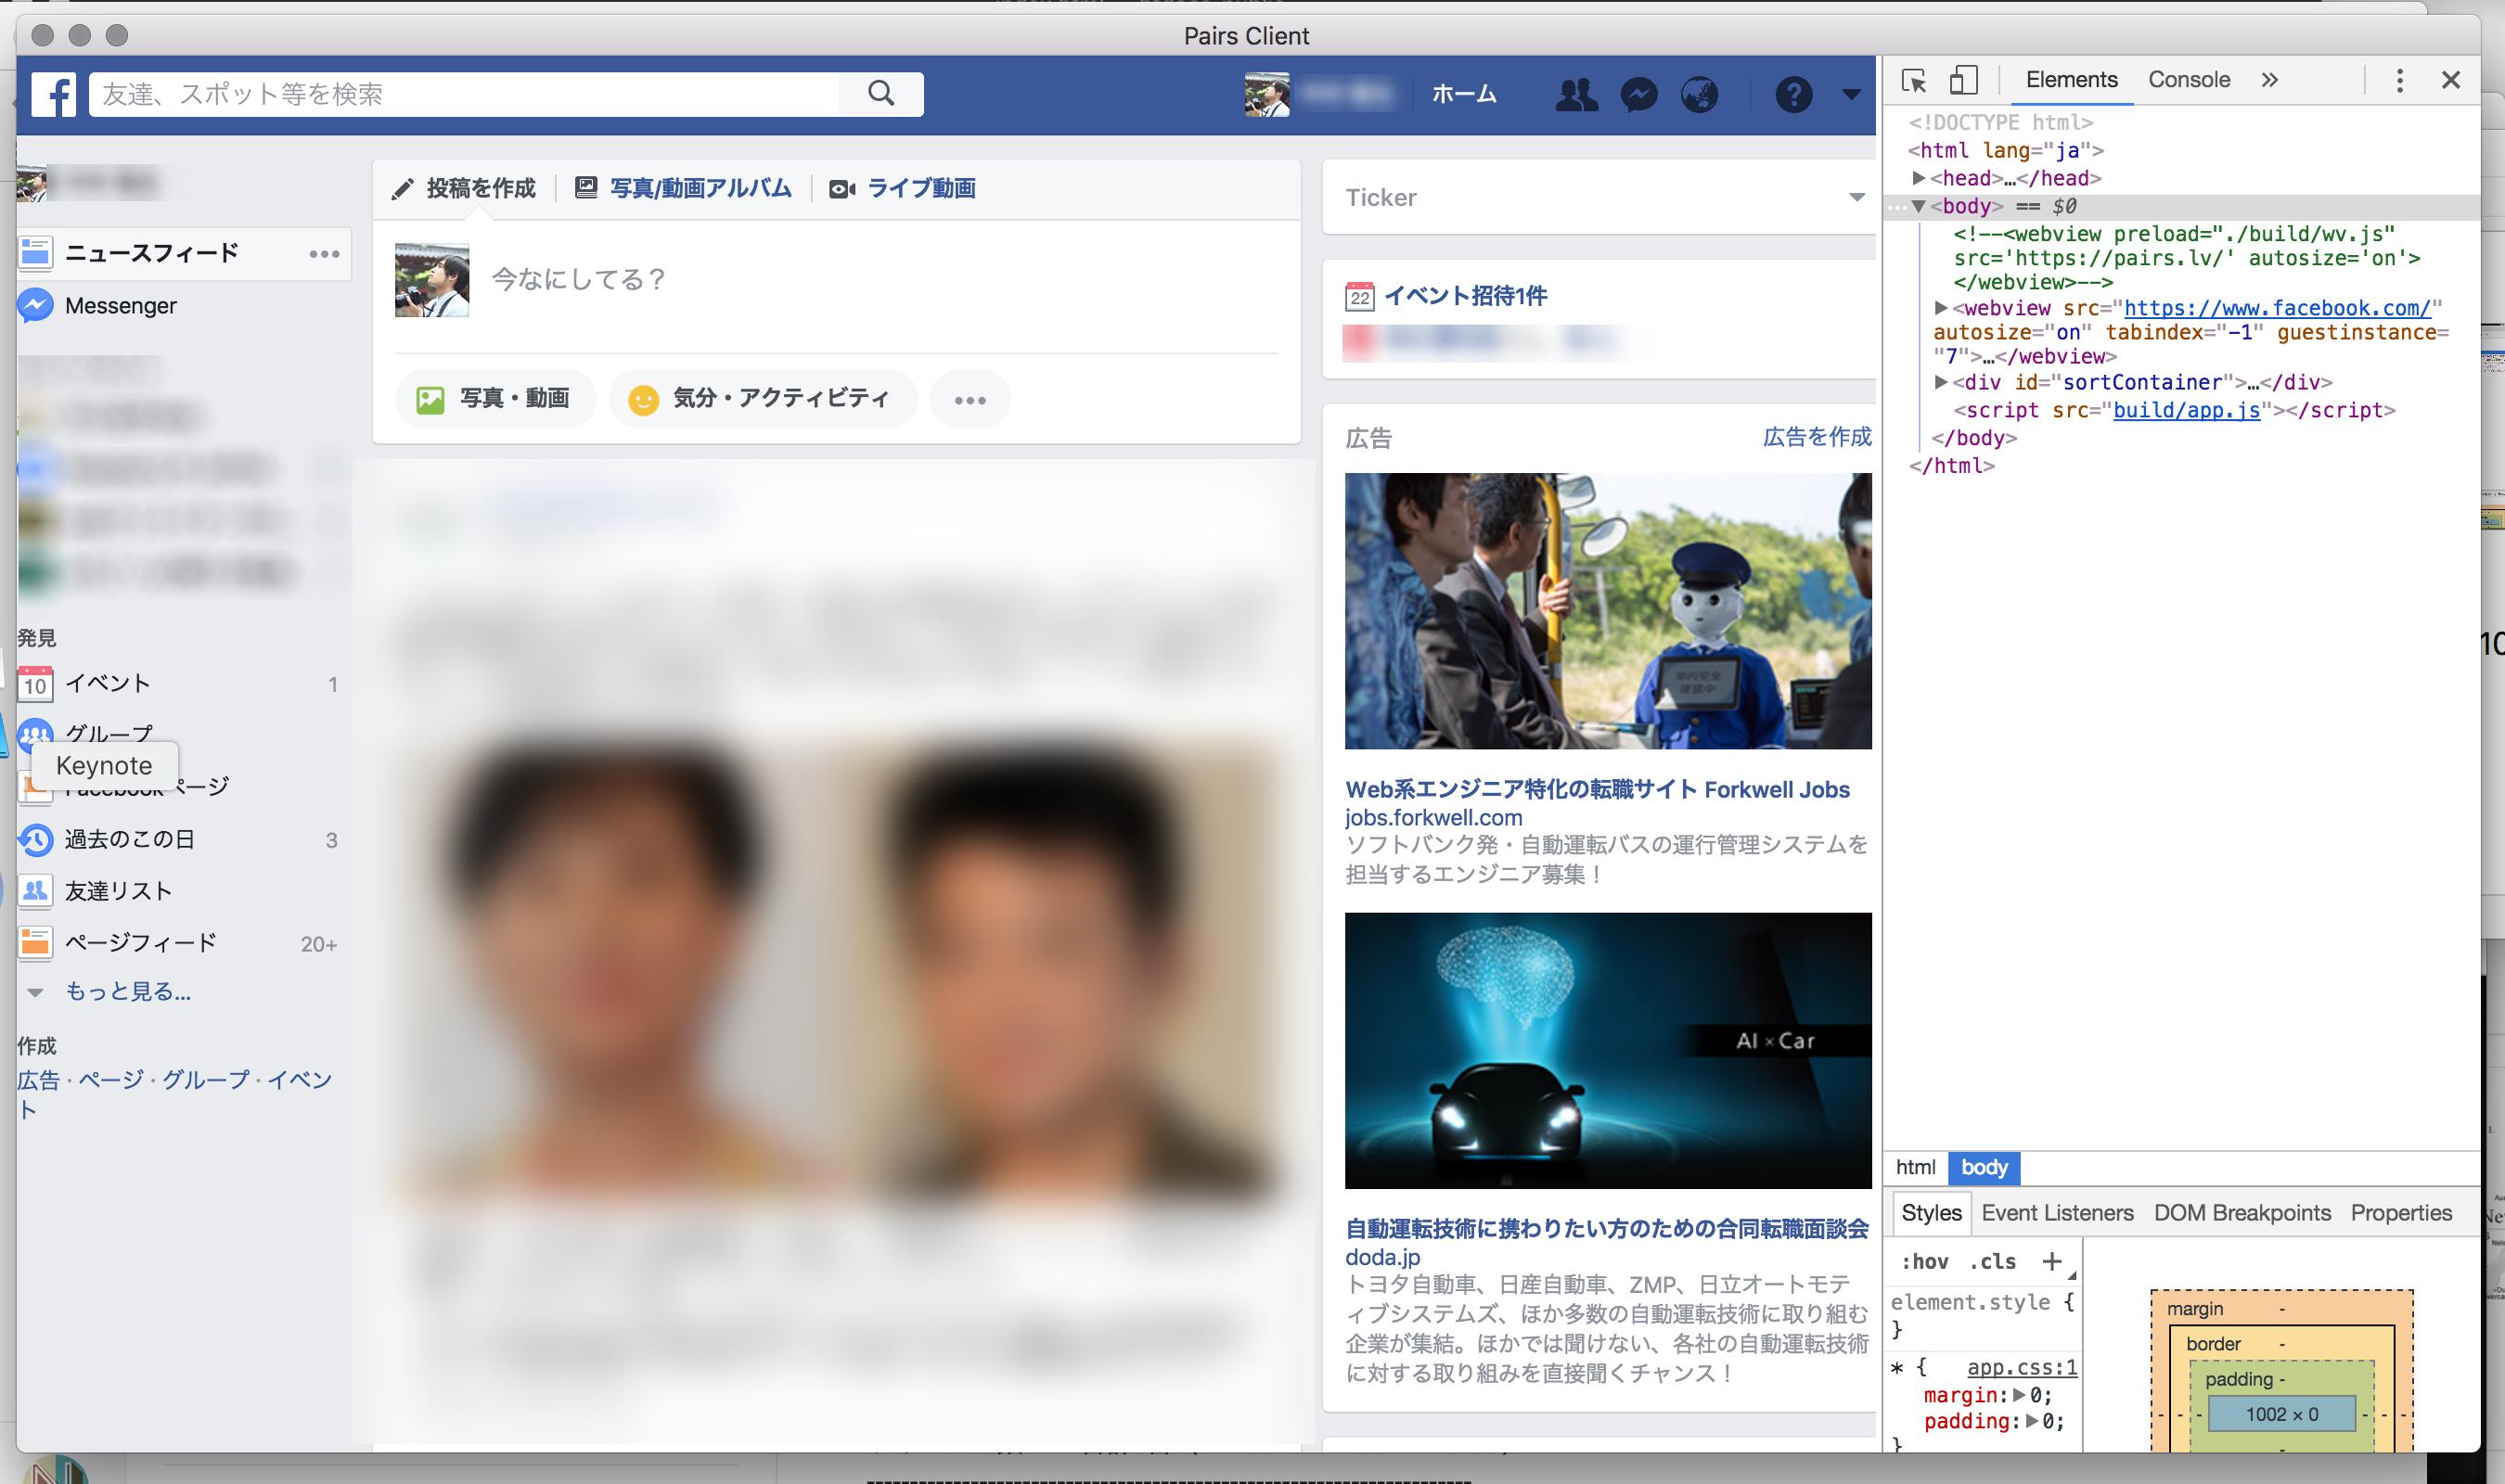 Screenshot 2017-07-10 22.54.38.png